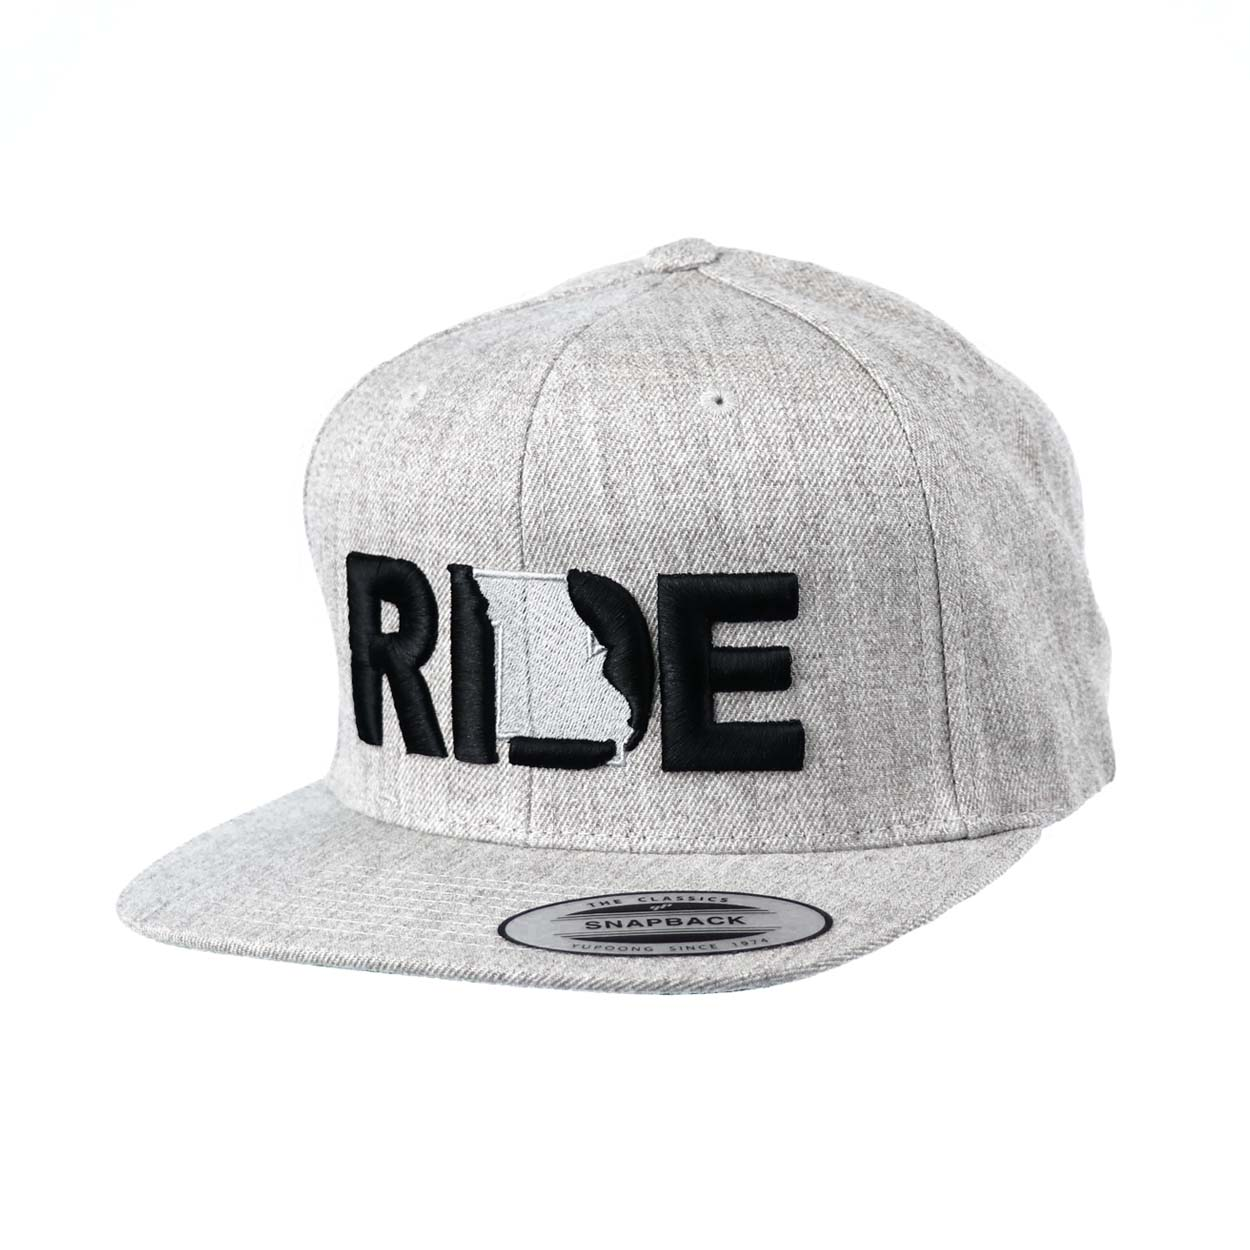 Ride Missouri Classic Embroidered  Snapback Flat Brim Hat Gray/Black